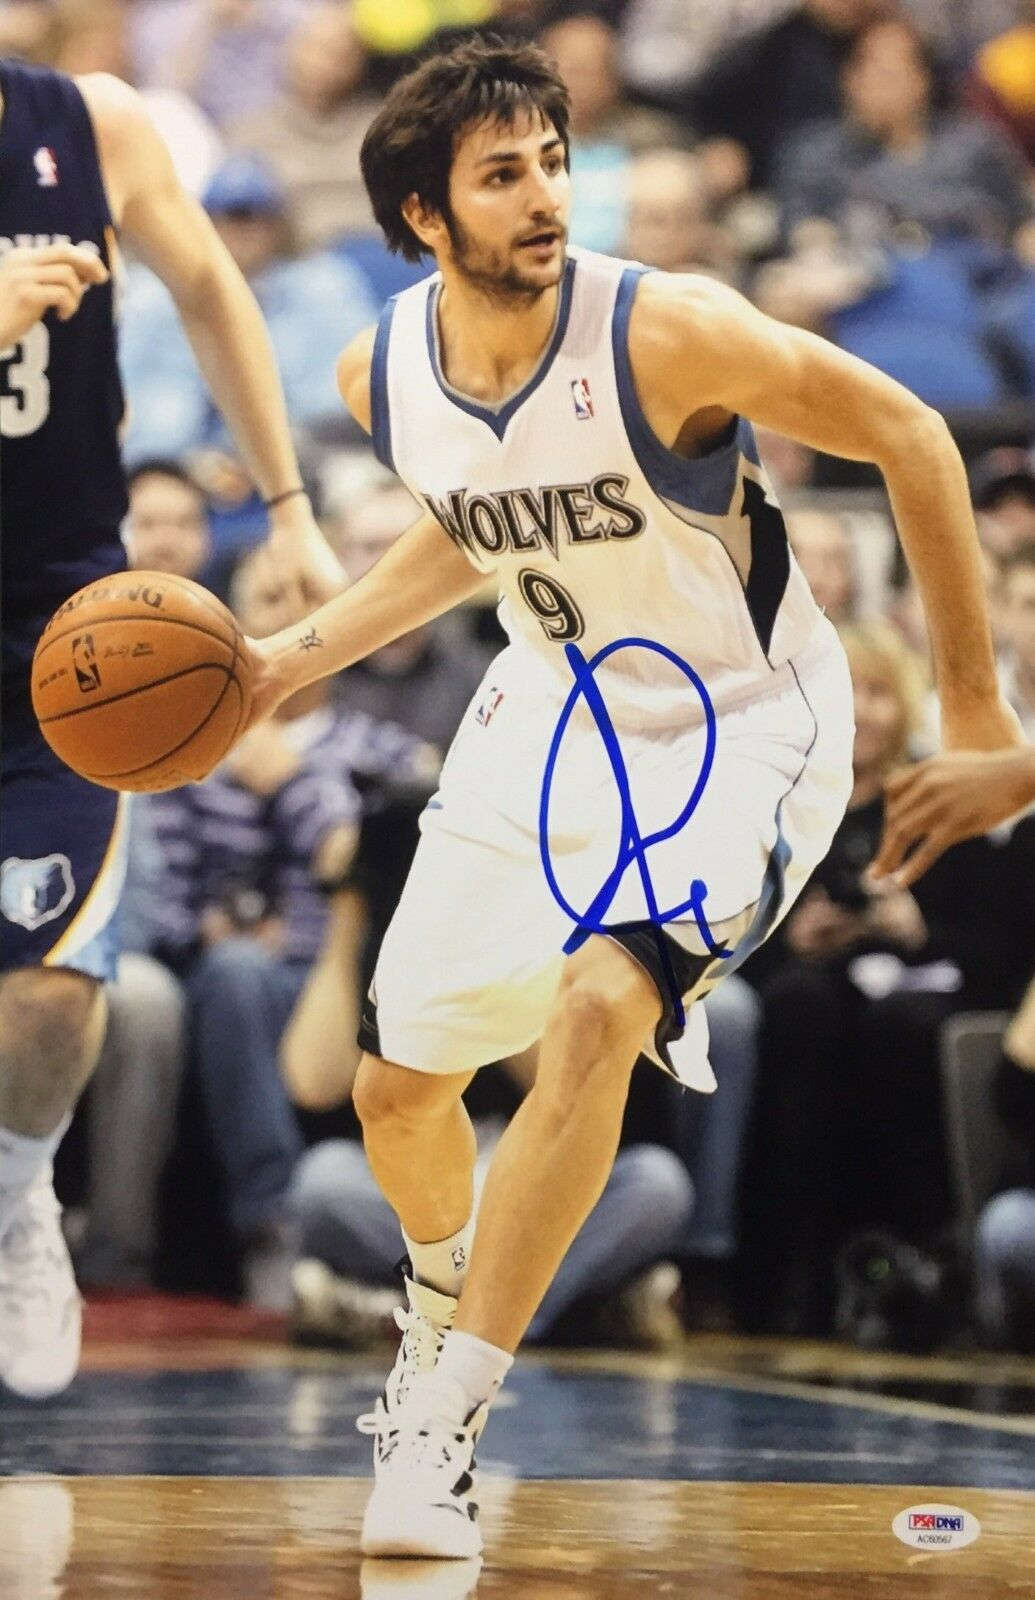 Ricky Rubio Signed Minnesota Timberwolves Basketball 12x18 Photo PSA AC60567